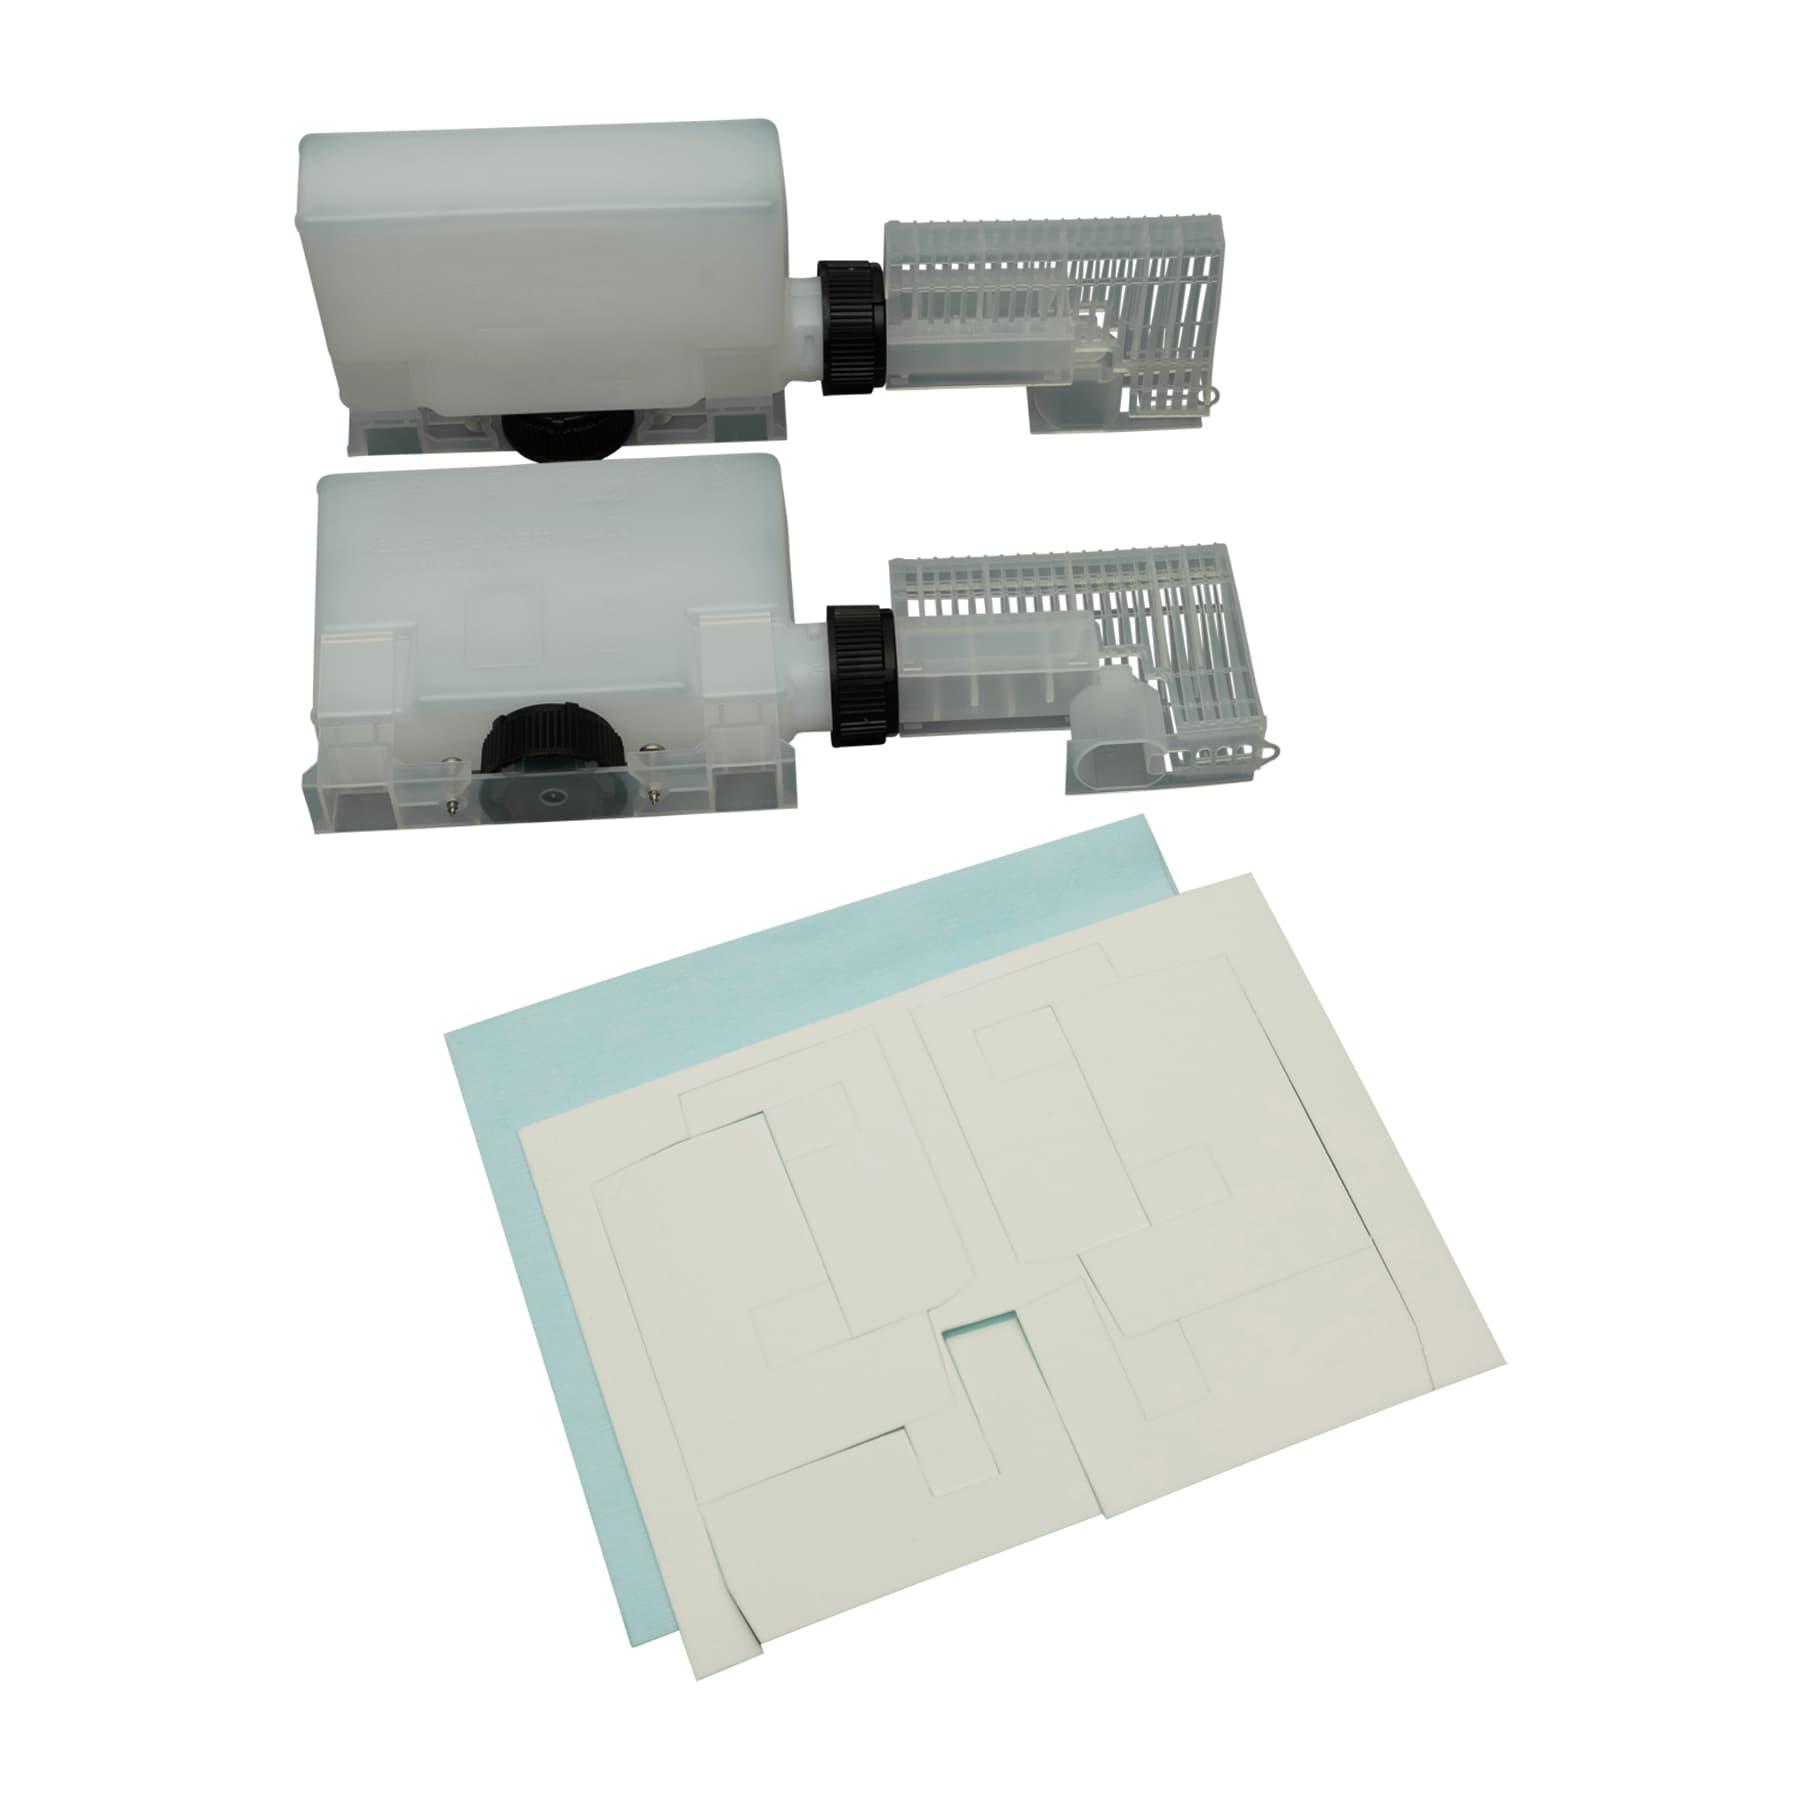 2 Nassenheider Horizontal Verdunster Doppelpack inkl. U-Dochte und 2 Vliestücher Hersteller Artikel Nr. 30025 NEUES MODELL